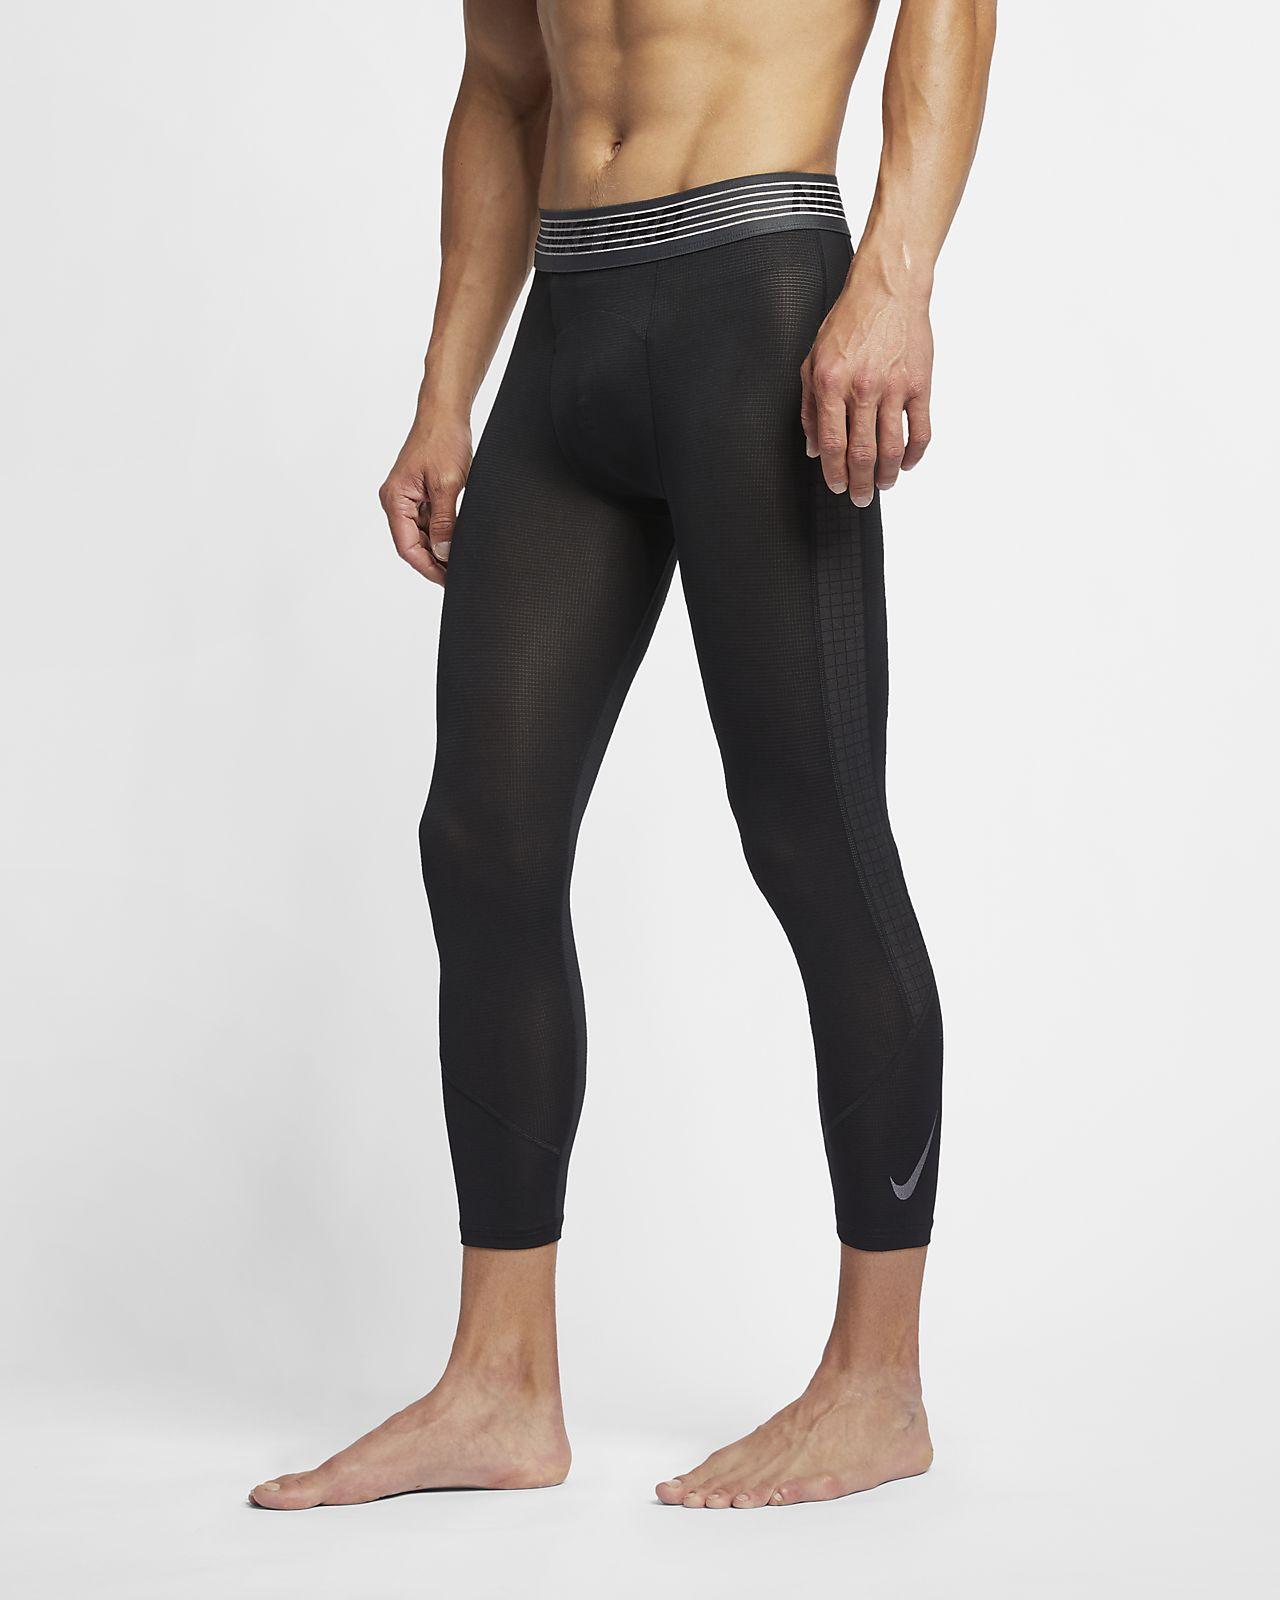 Heren Leggings van Nike   Stylight